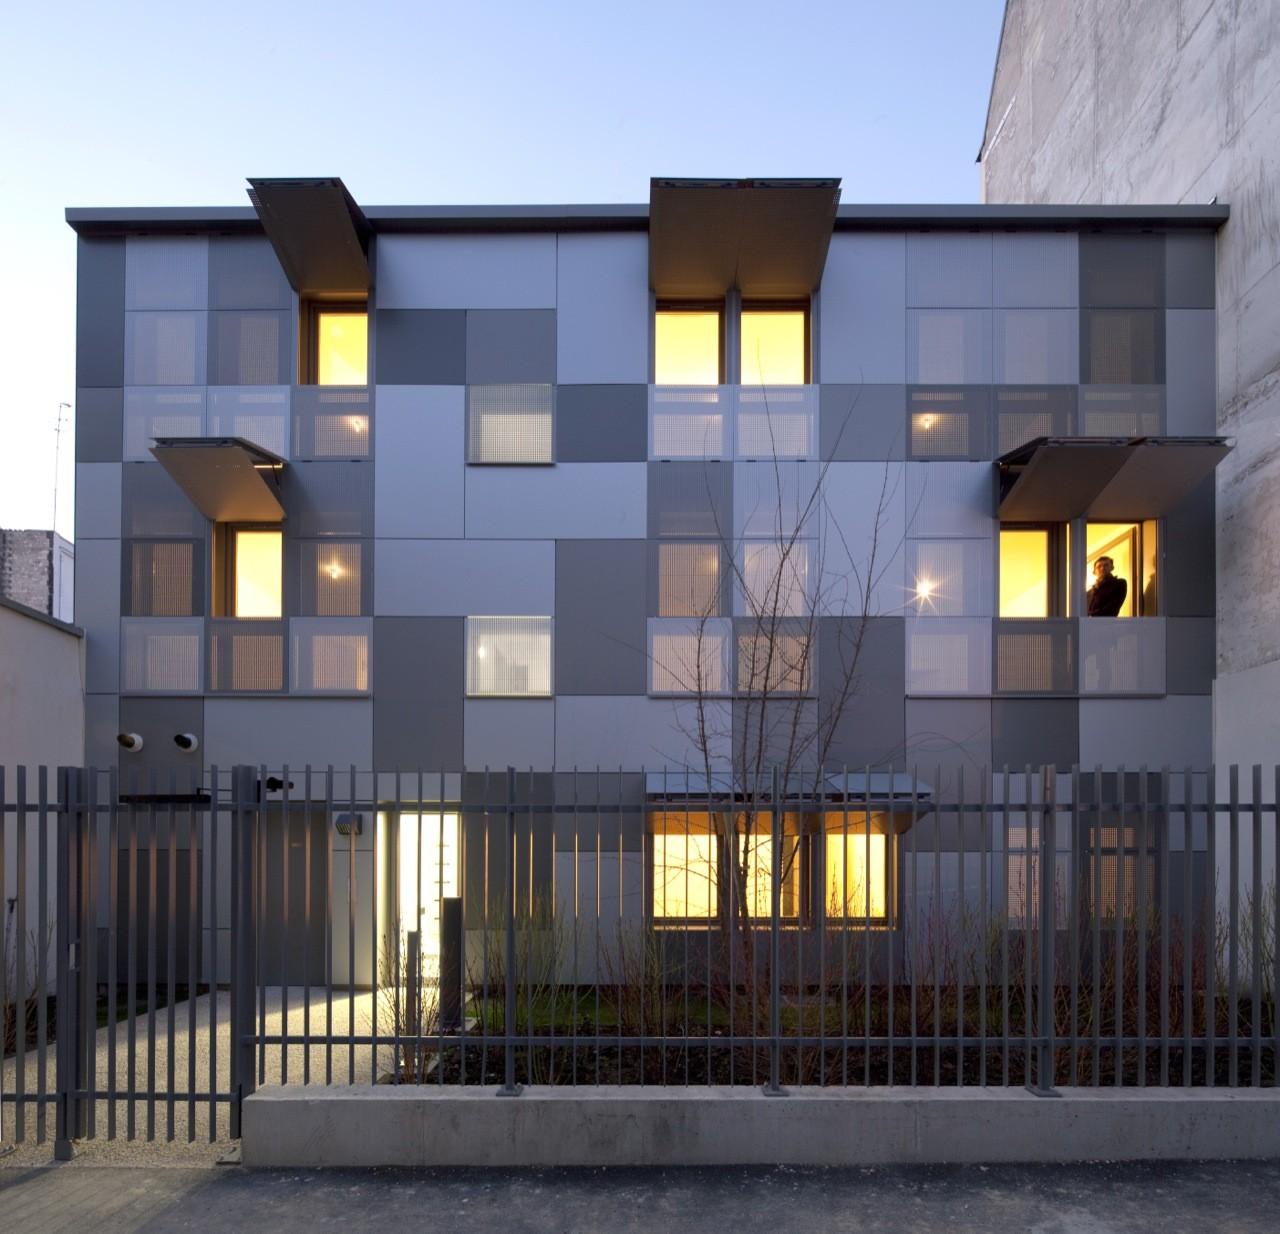 10 Logements Paris / RMDM Architectes, Courtesy of rmdm architectes